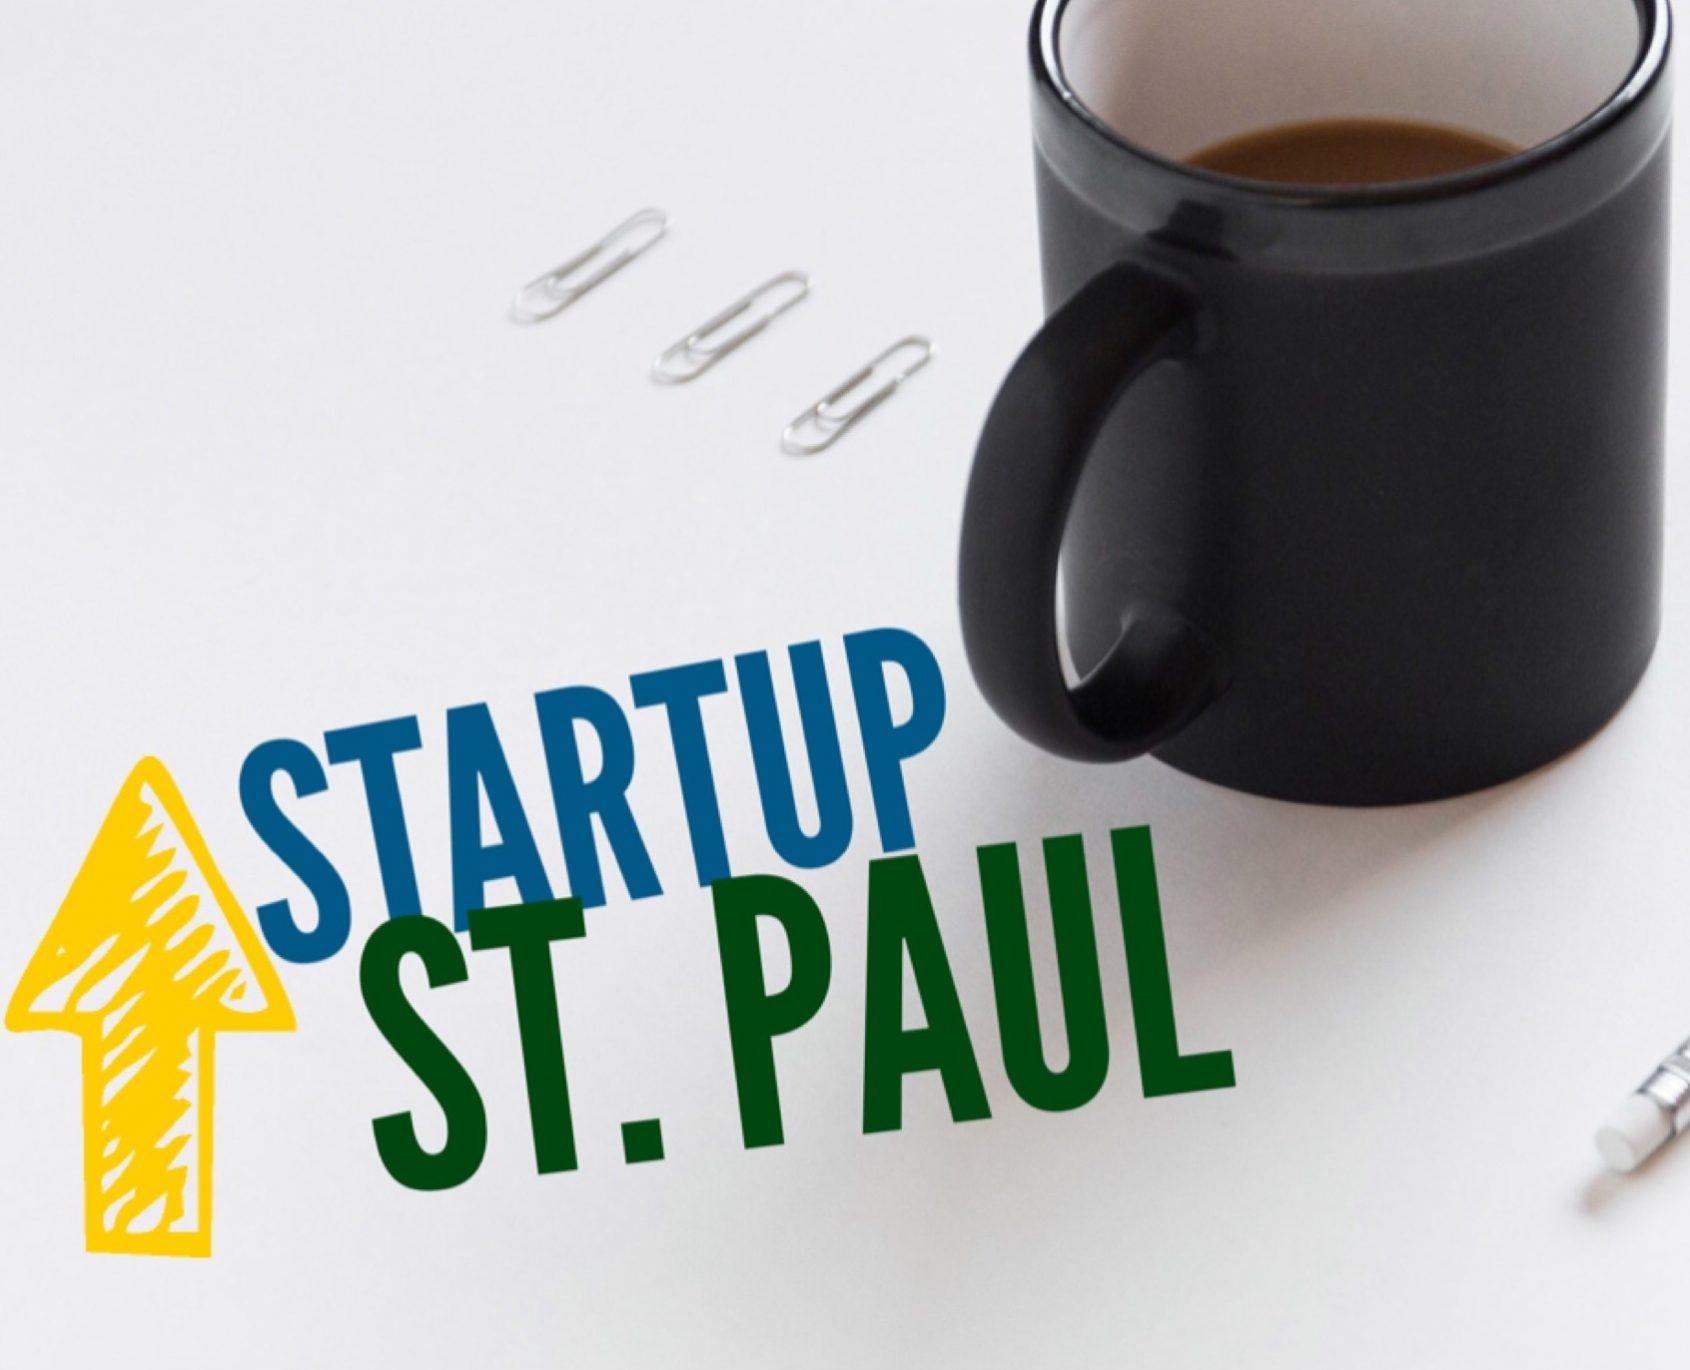 Startup St Paul